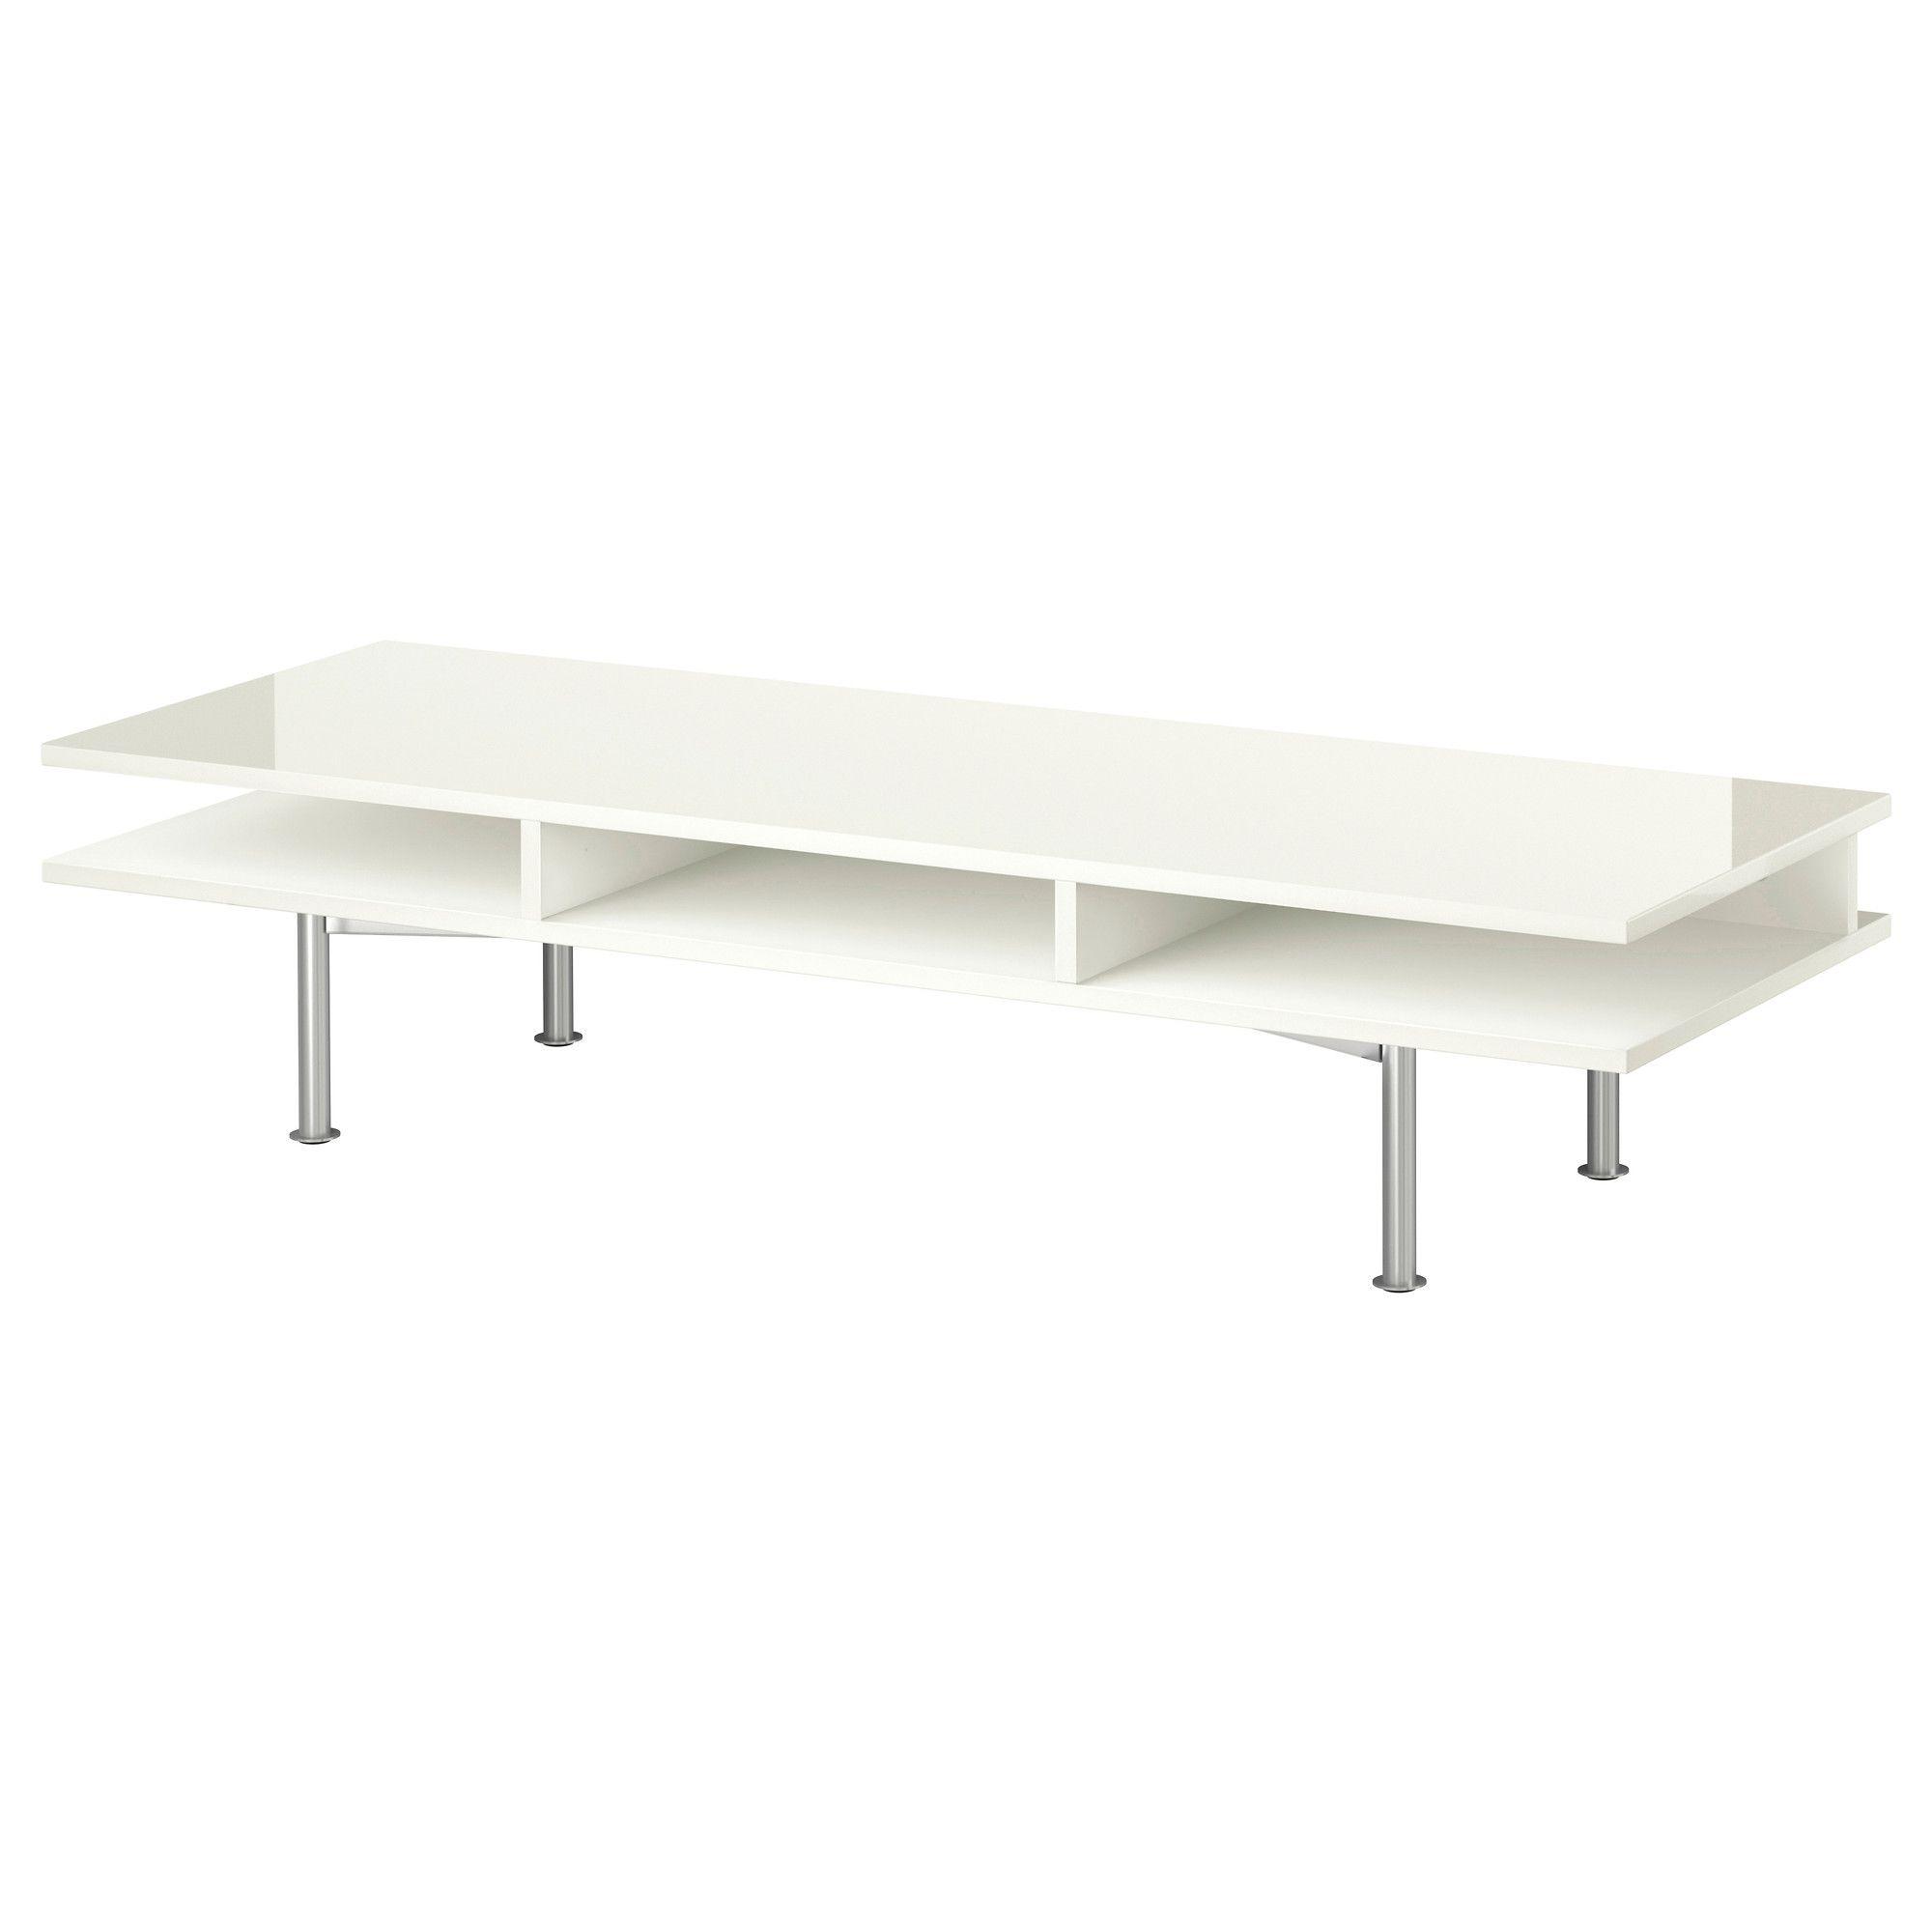 Tofteryd Tv Unit High Gloss White Ikea Liz S Board Ikea Tv